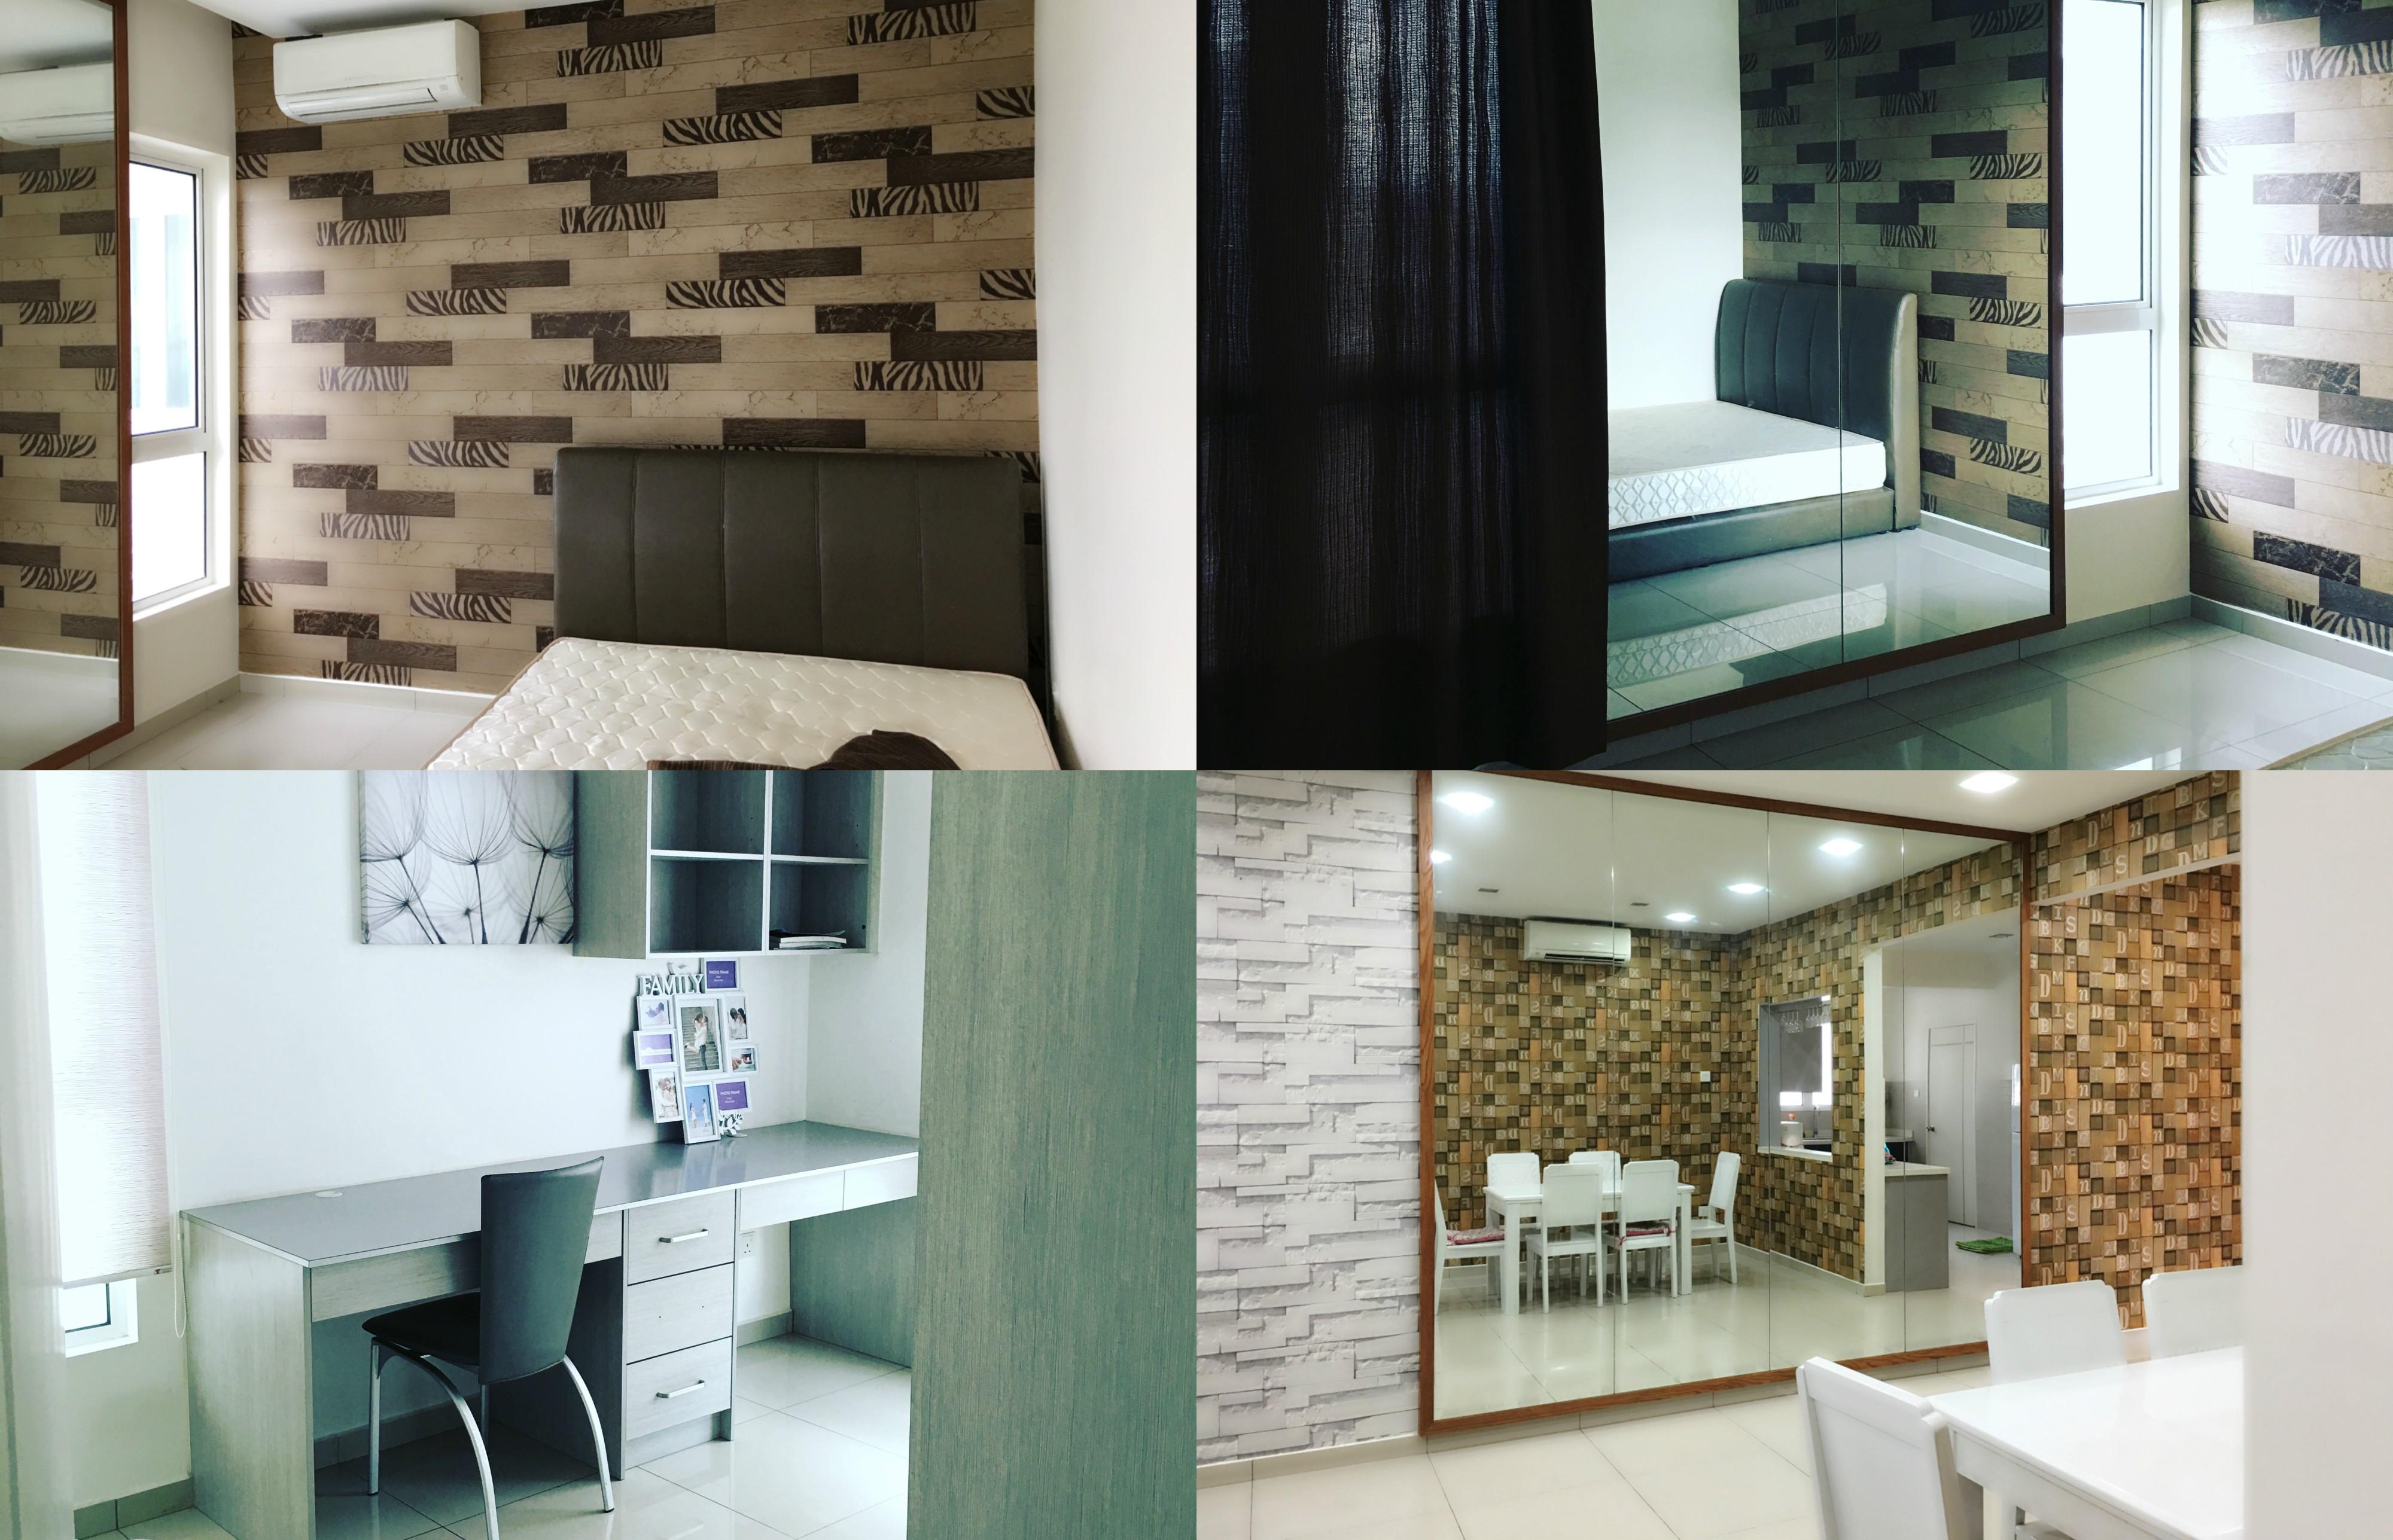 1-sentul accommodatuon hostel room rent cheap student